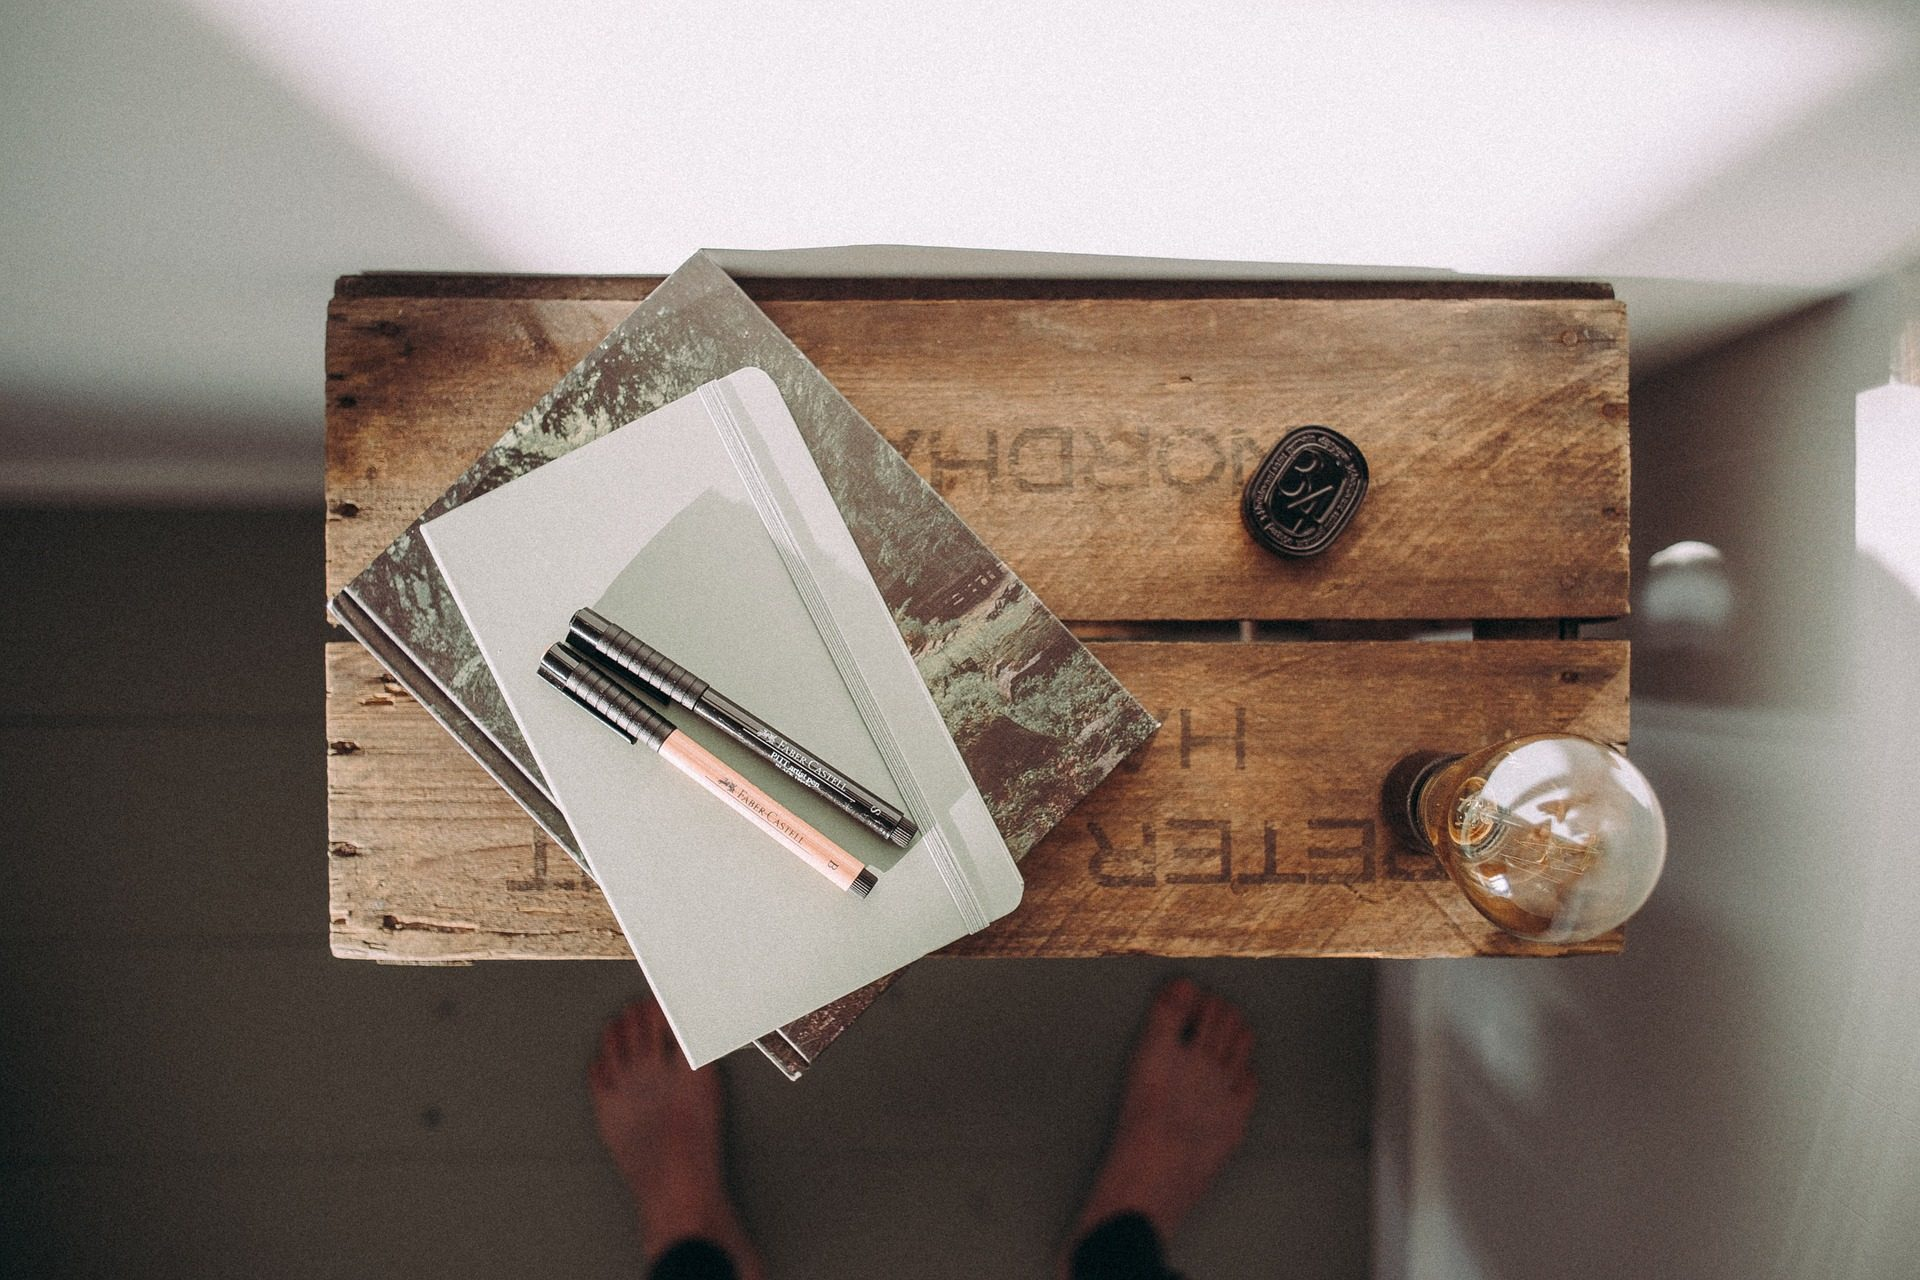 tavolo, Desktop, Notebook, lampadina, legno, piedi - Sfondi HD - Professor-falken.com